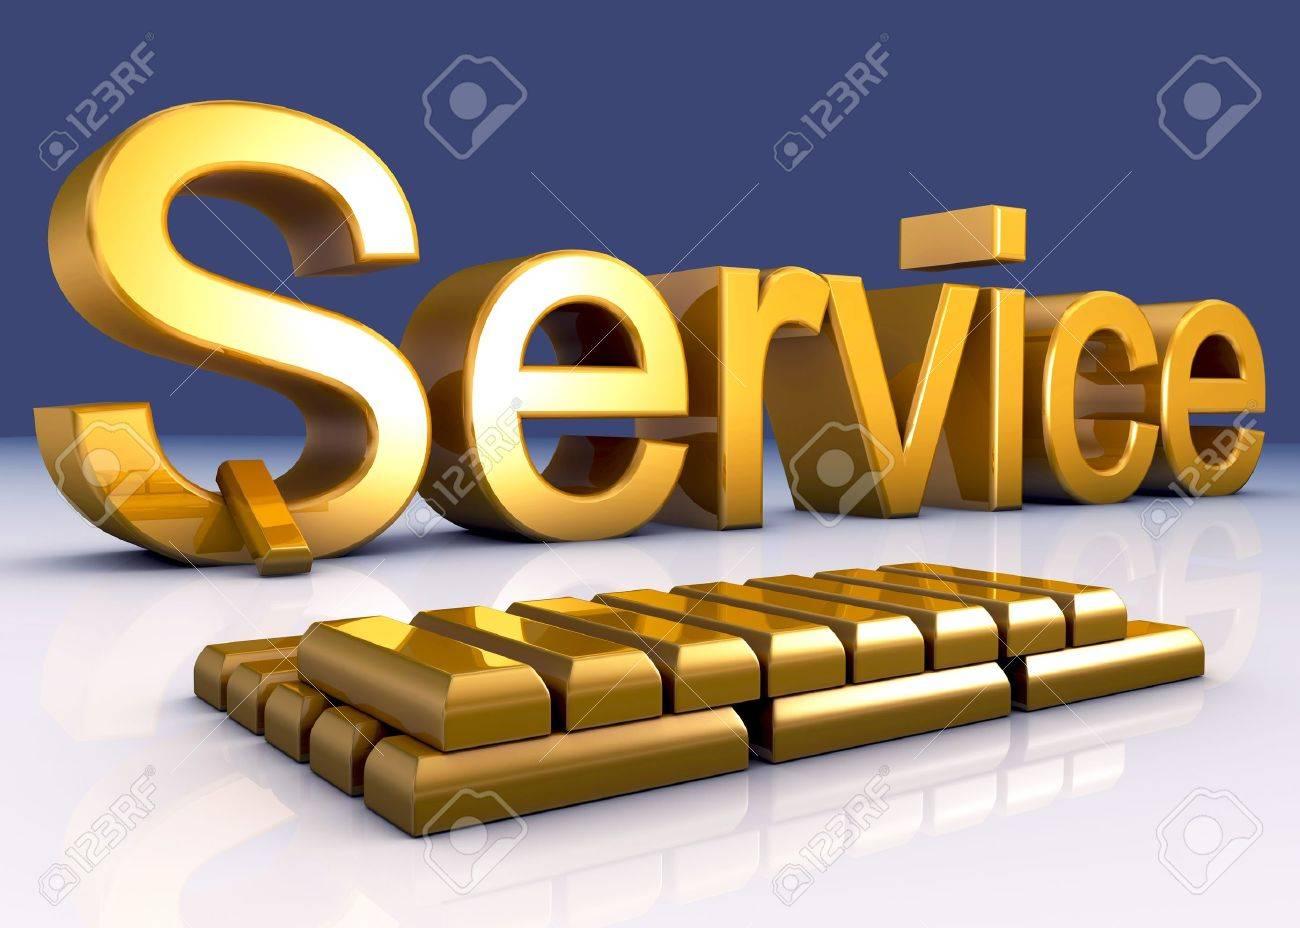 Gold Service Standard-Bild - 8524727